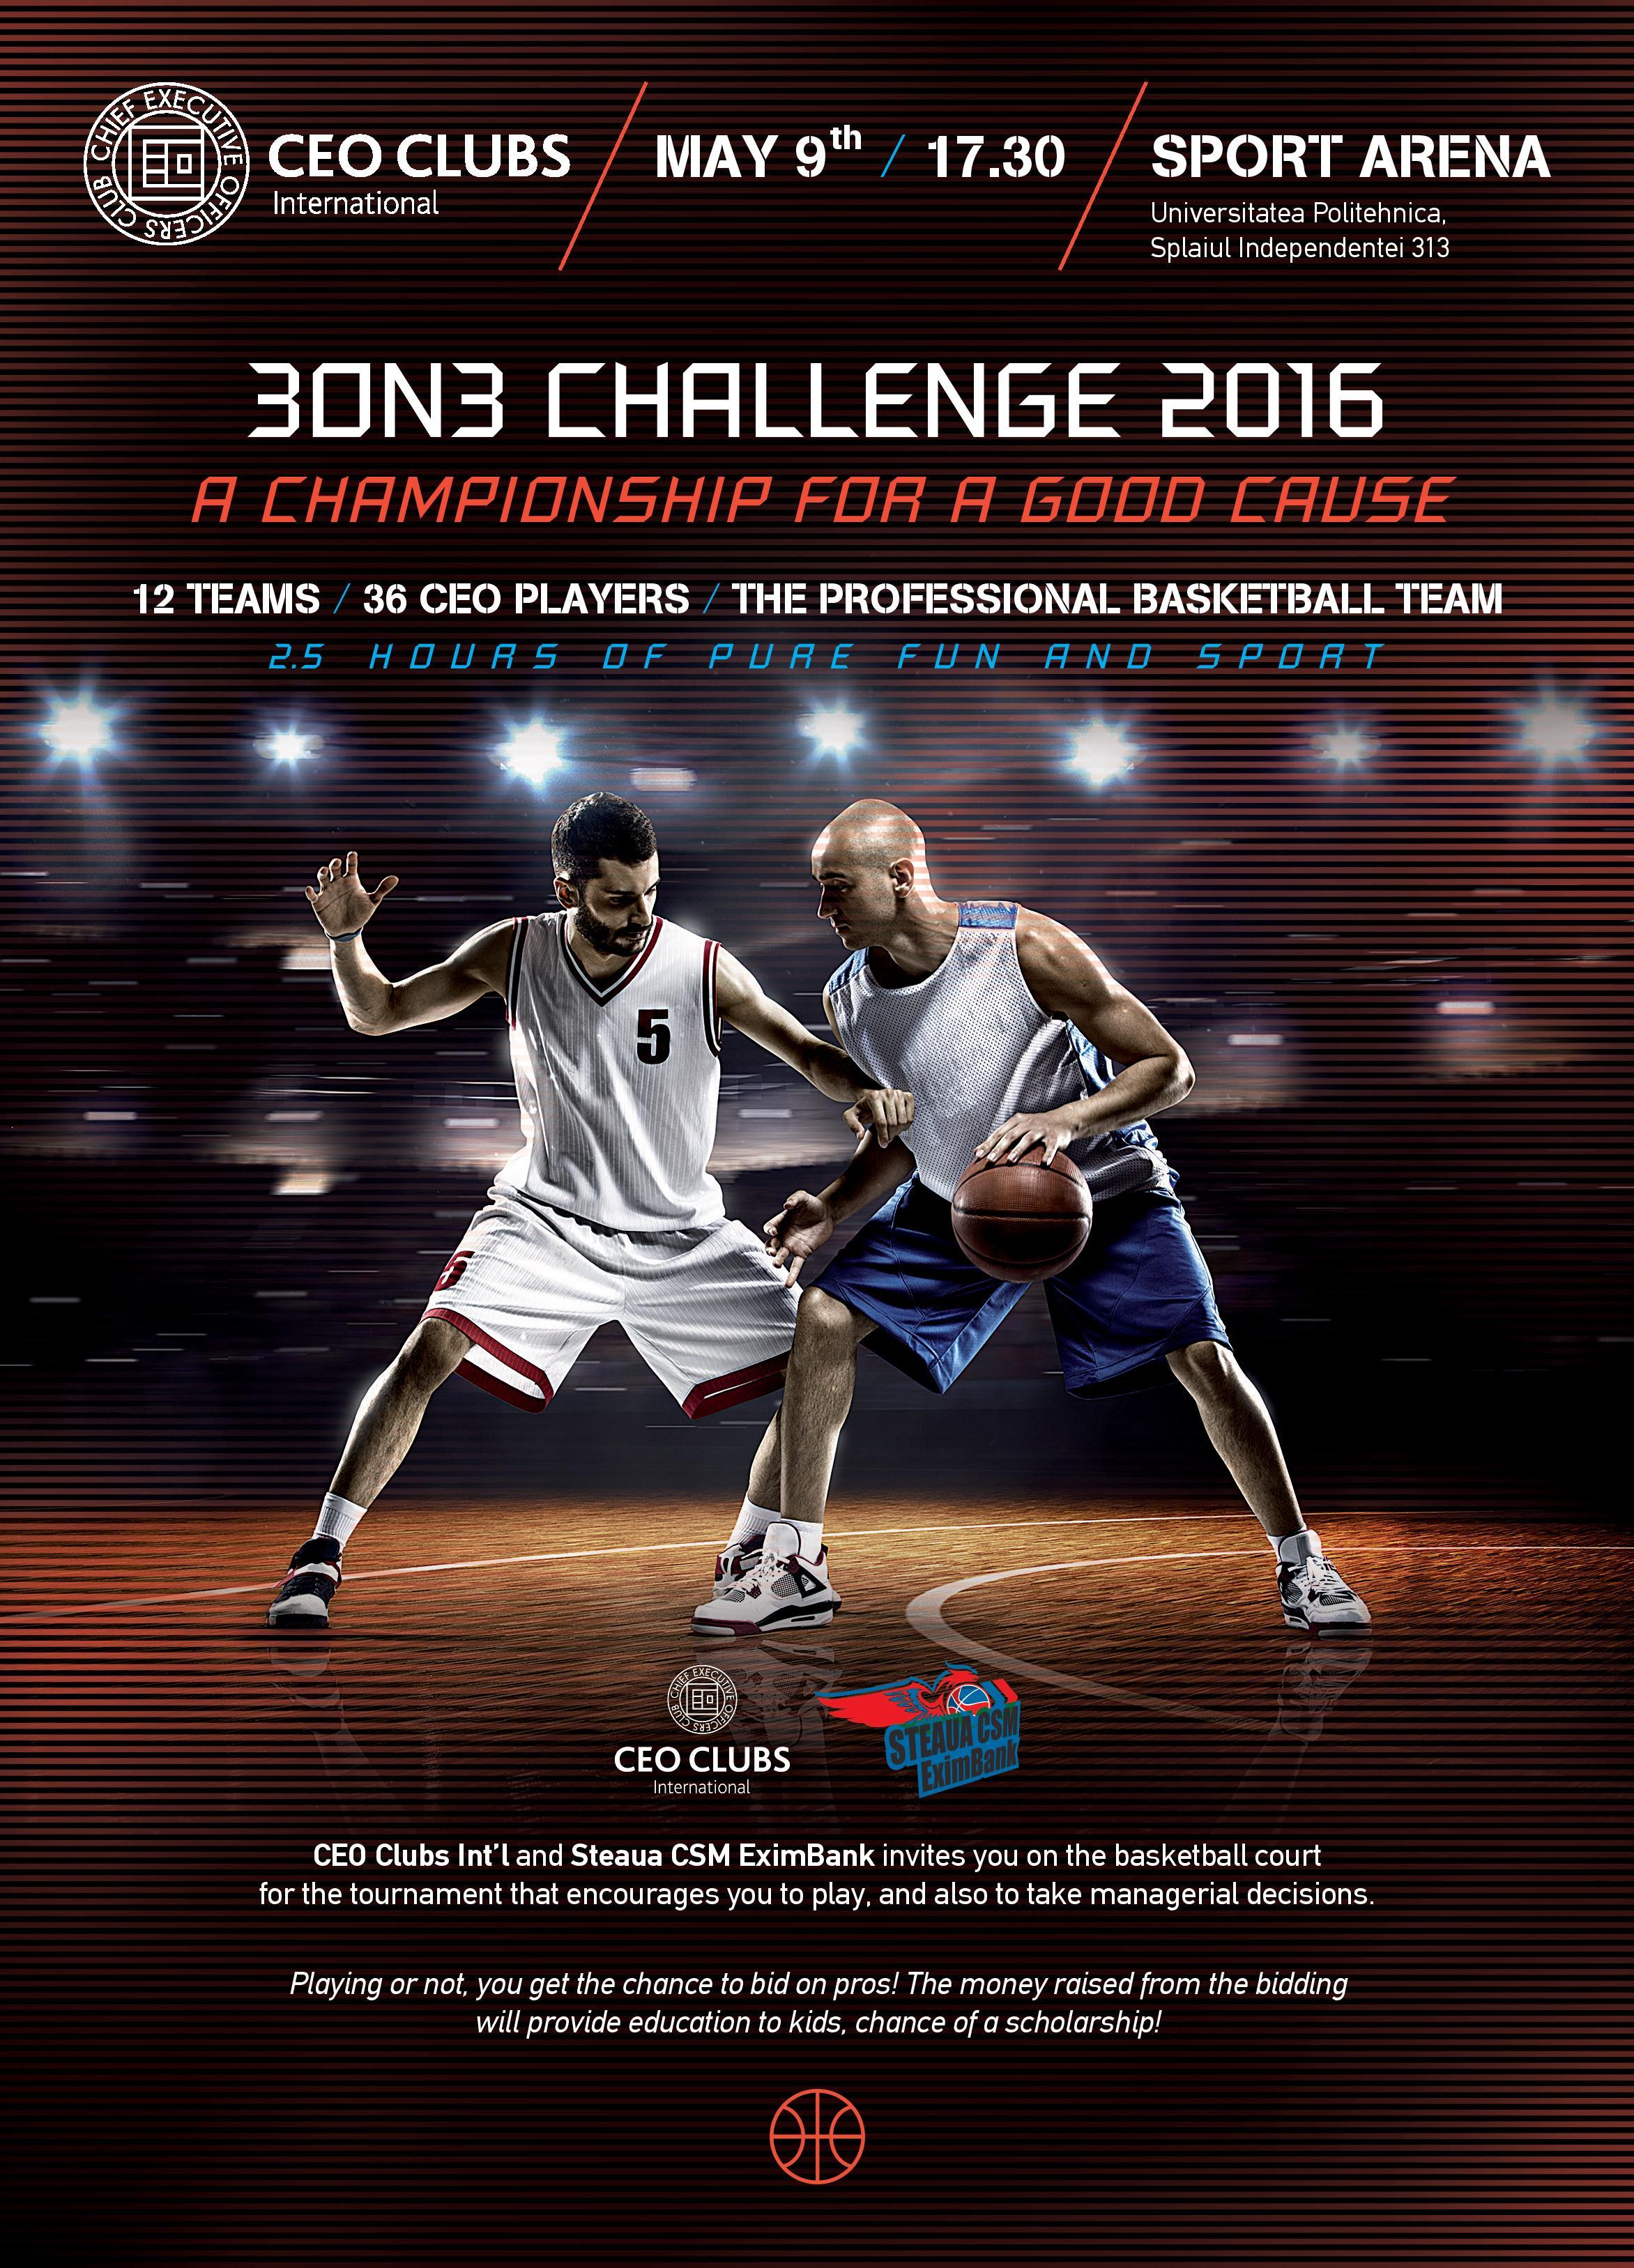 3on3 Basketball Challenge 2016